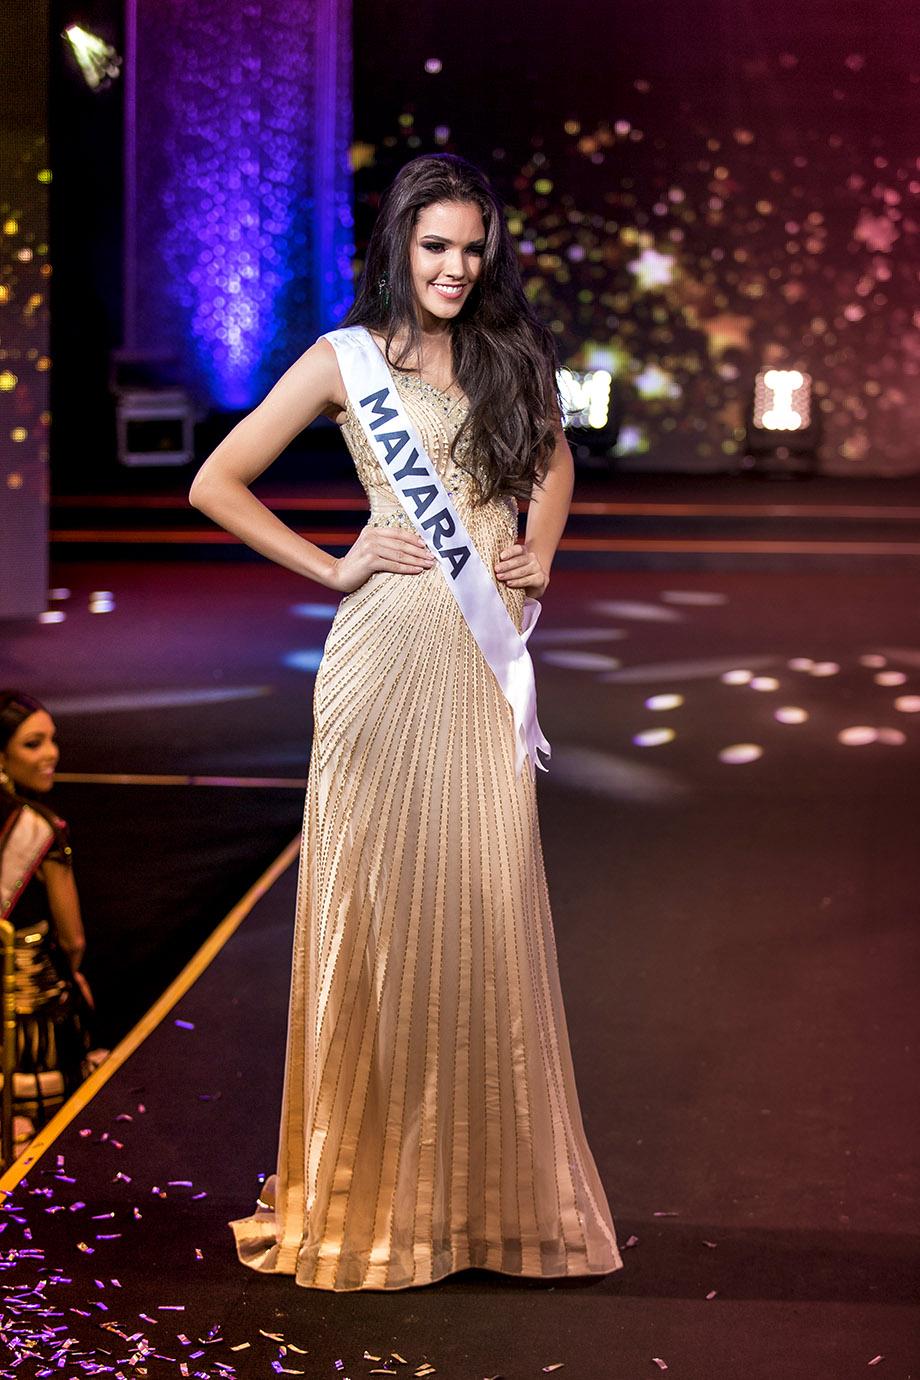 Blog Cris Moreira - Miss Fortaleza 2016 - 22